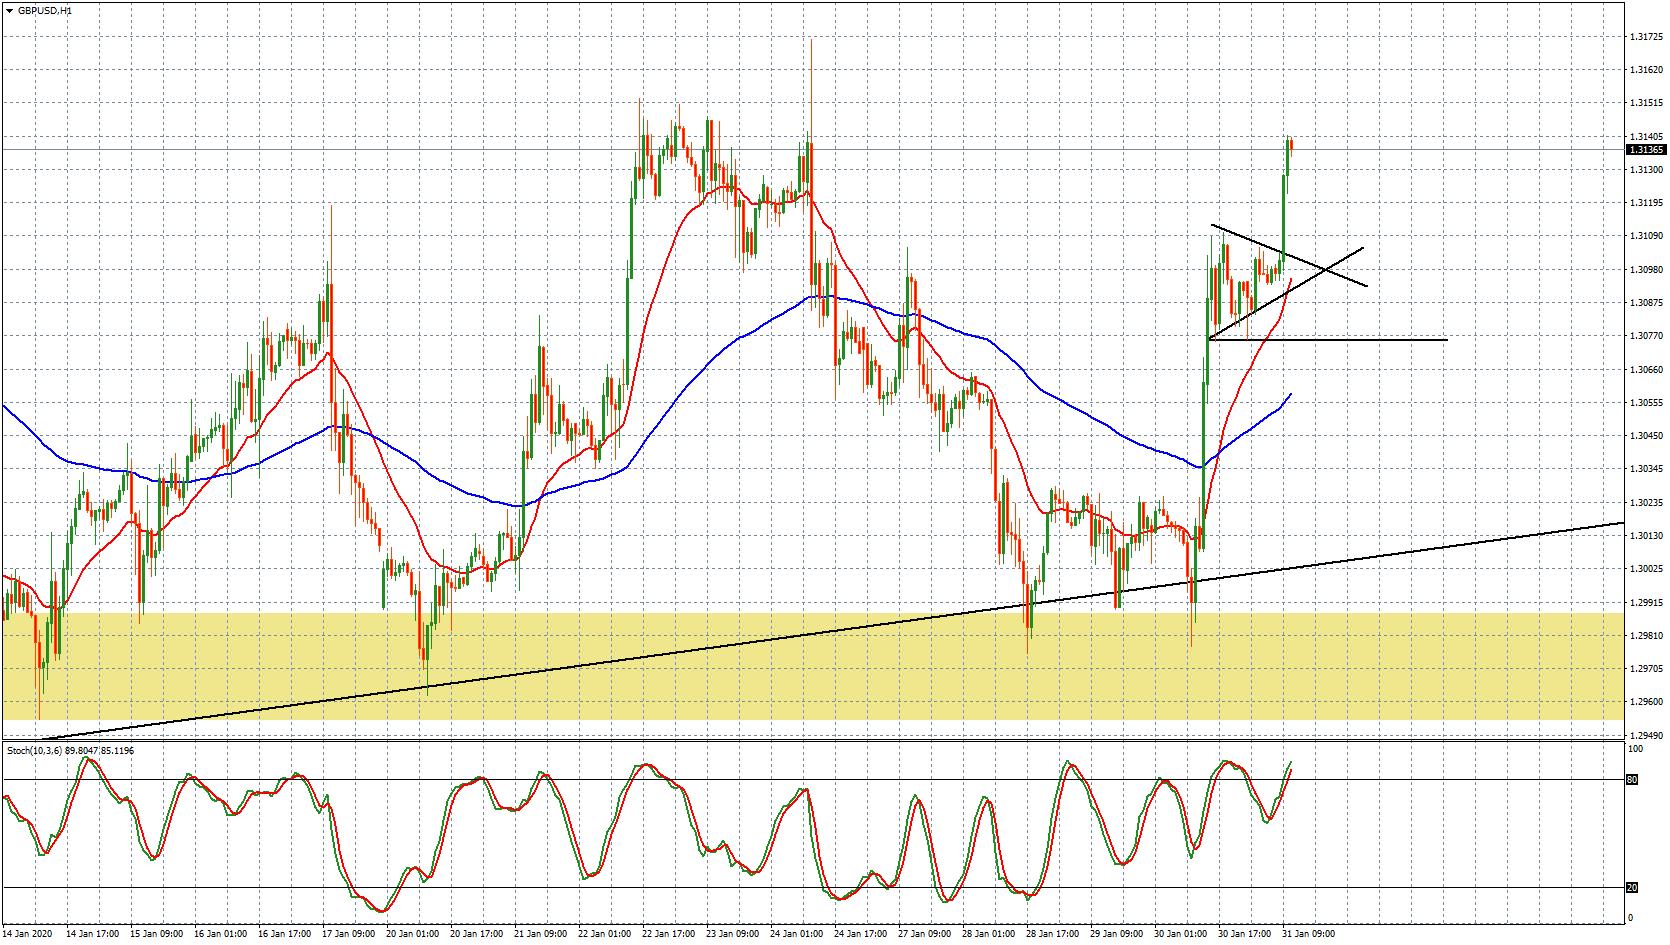 GBP/USD - grafico orario